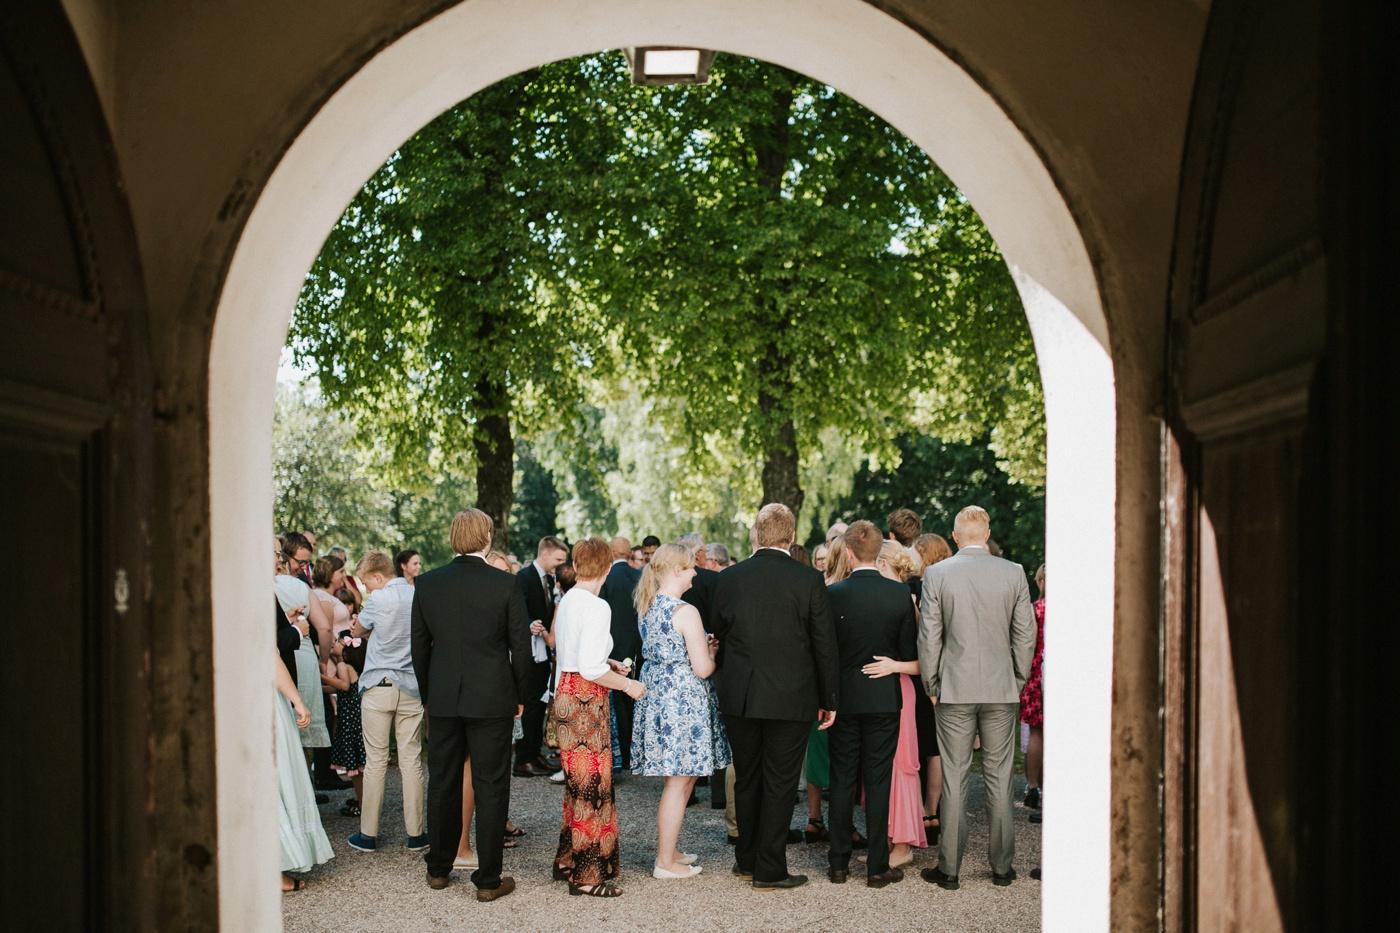 ceciliajoakim_sweden-countryside-summer-wedding_melbourne-fun-quirky-wedding-photography_27